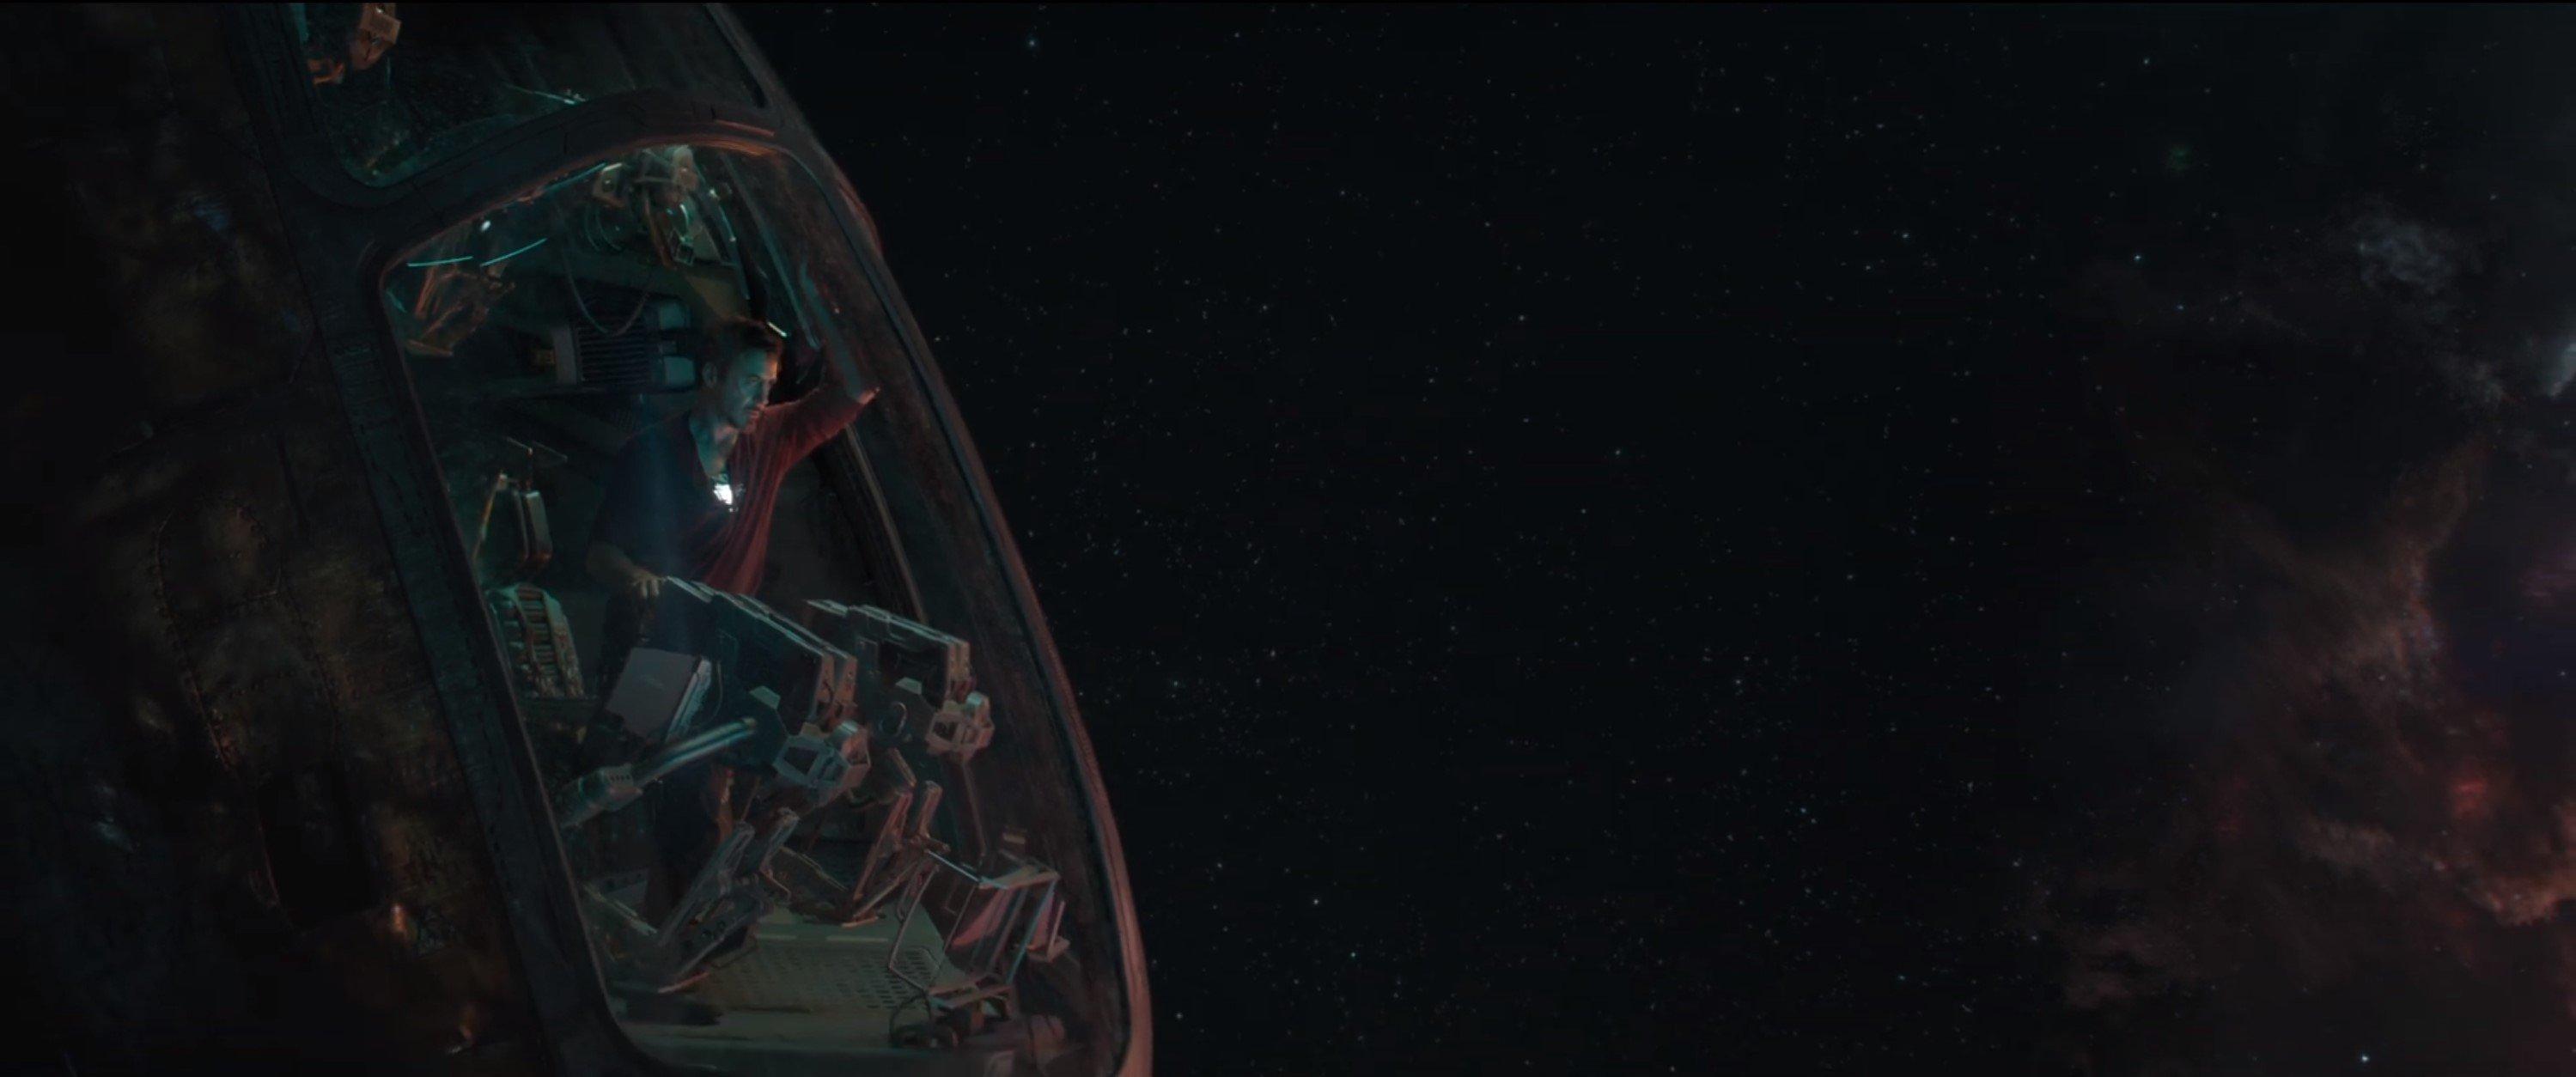 Мстители: Финал. Тони Старк